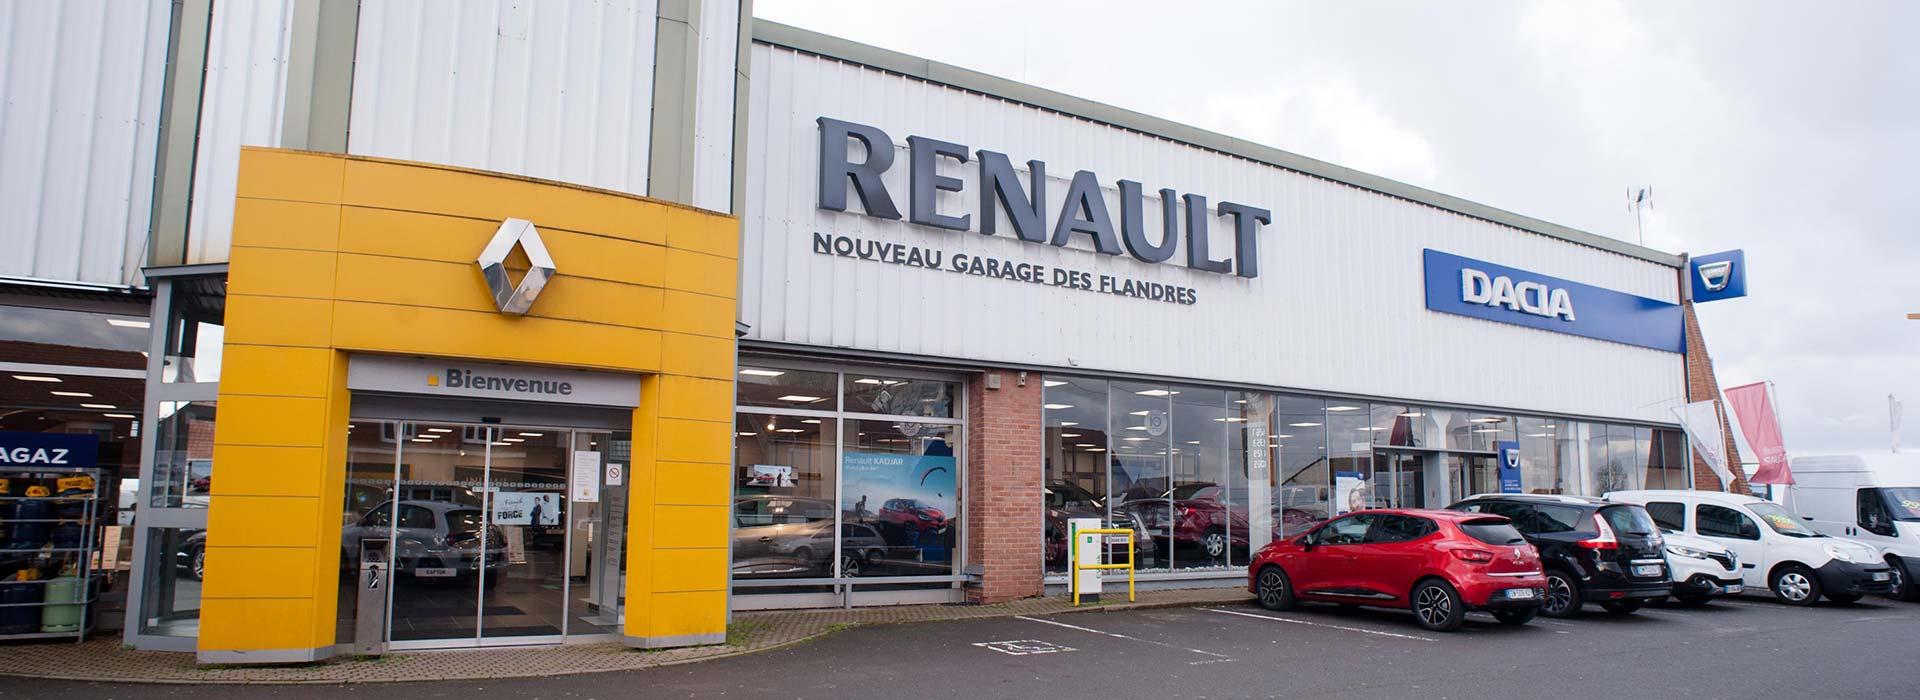 Renault dunkerque concessionnaire garage nord 59 - Garage occasion dunkerque ...